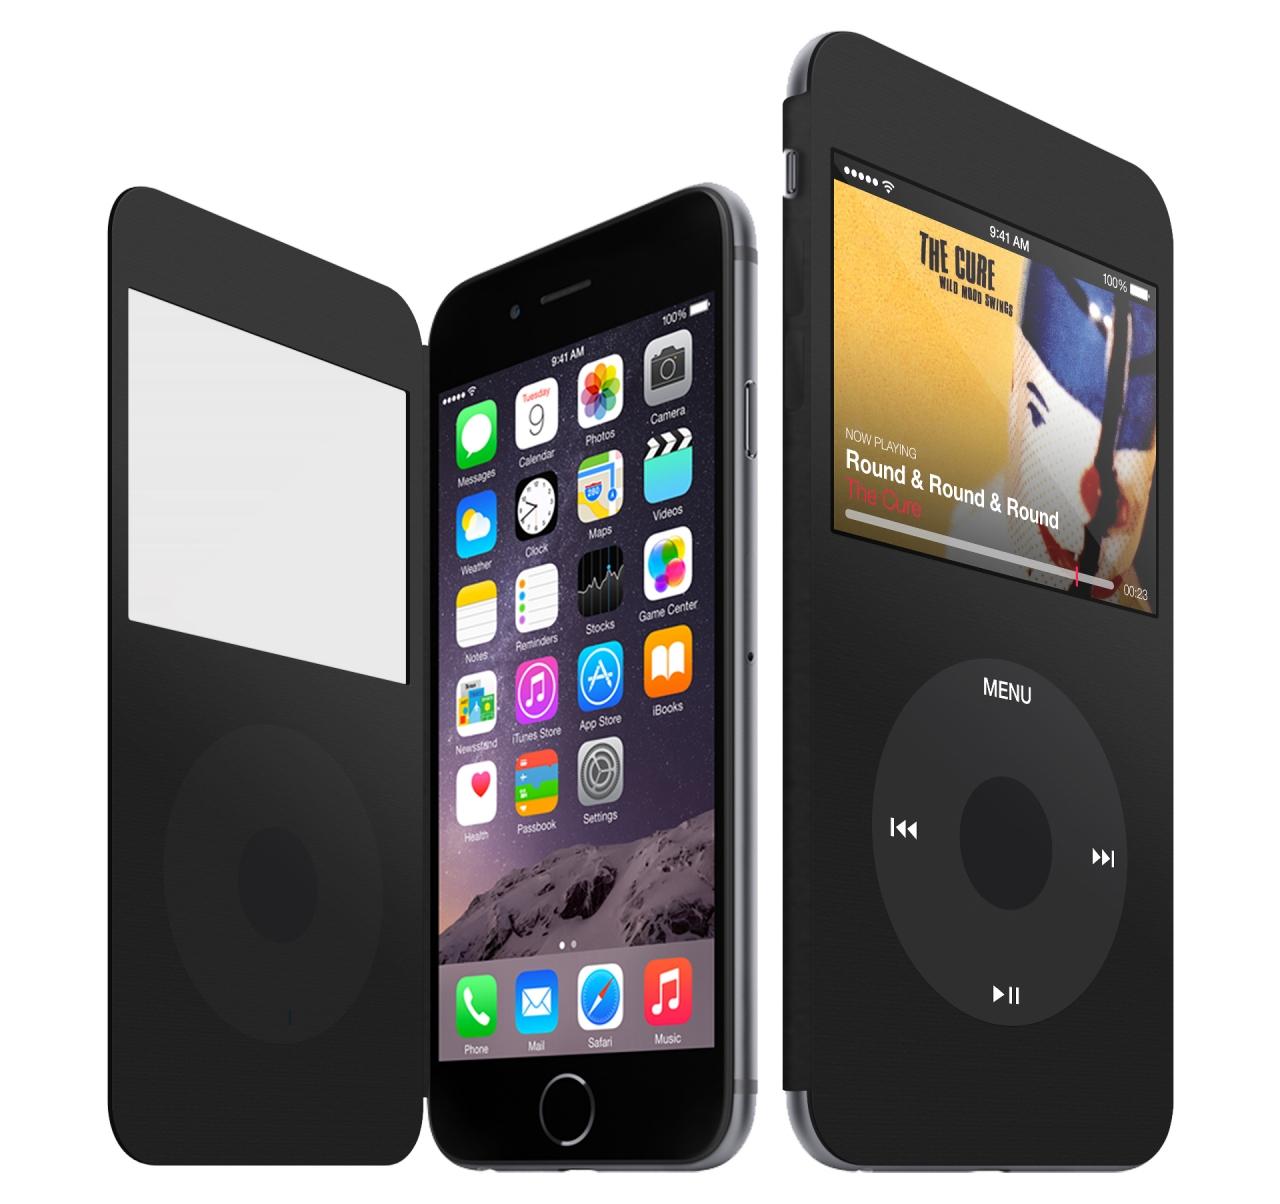 iPod-classic-capinha-iphone-conceito2